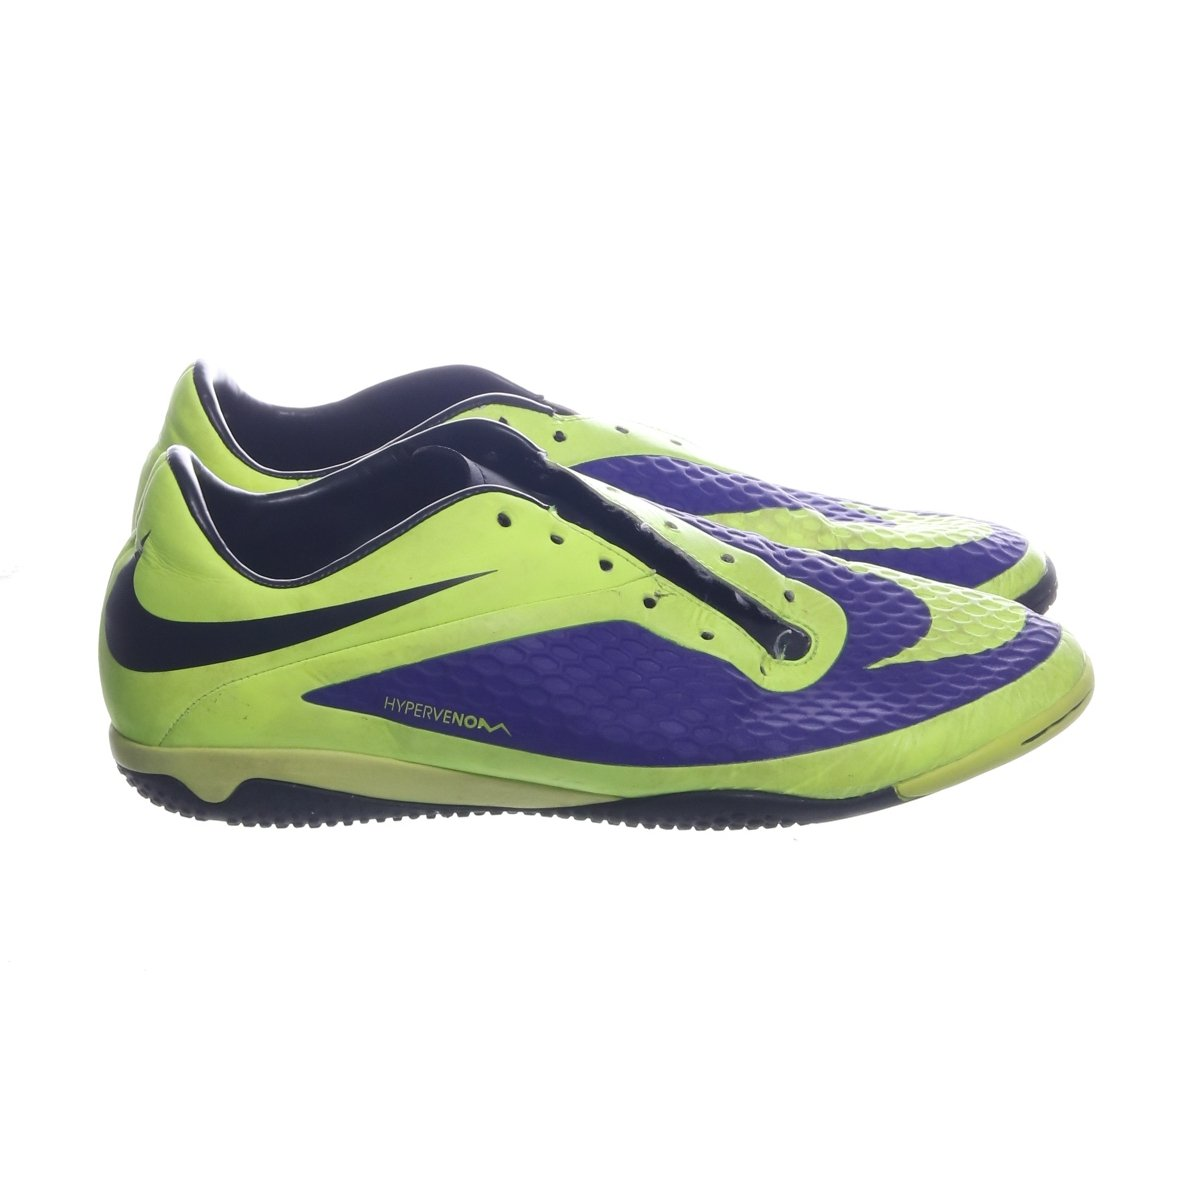 size 40 2d3ae 49eb9 Nike, Fotbollsskor, Strl  42, Hypervenom, Lila Gul ...